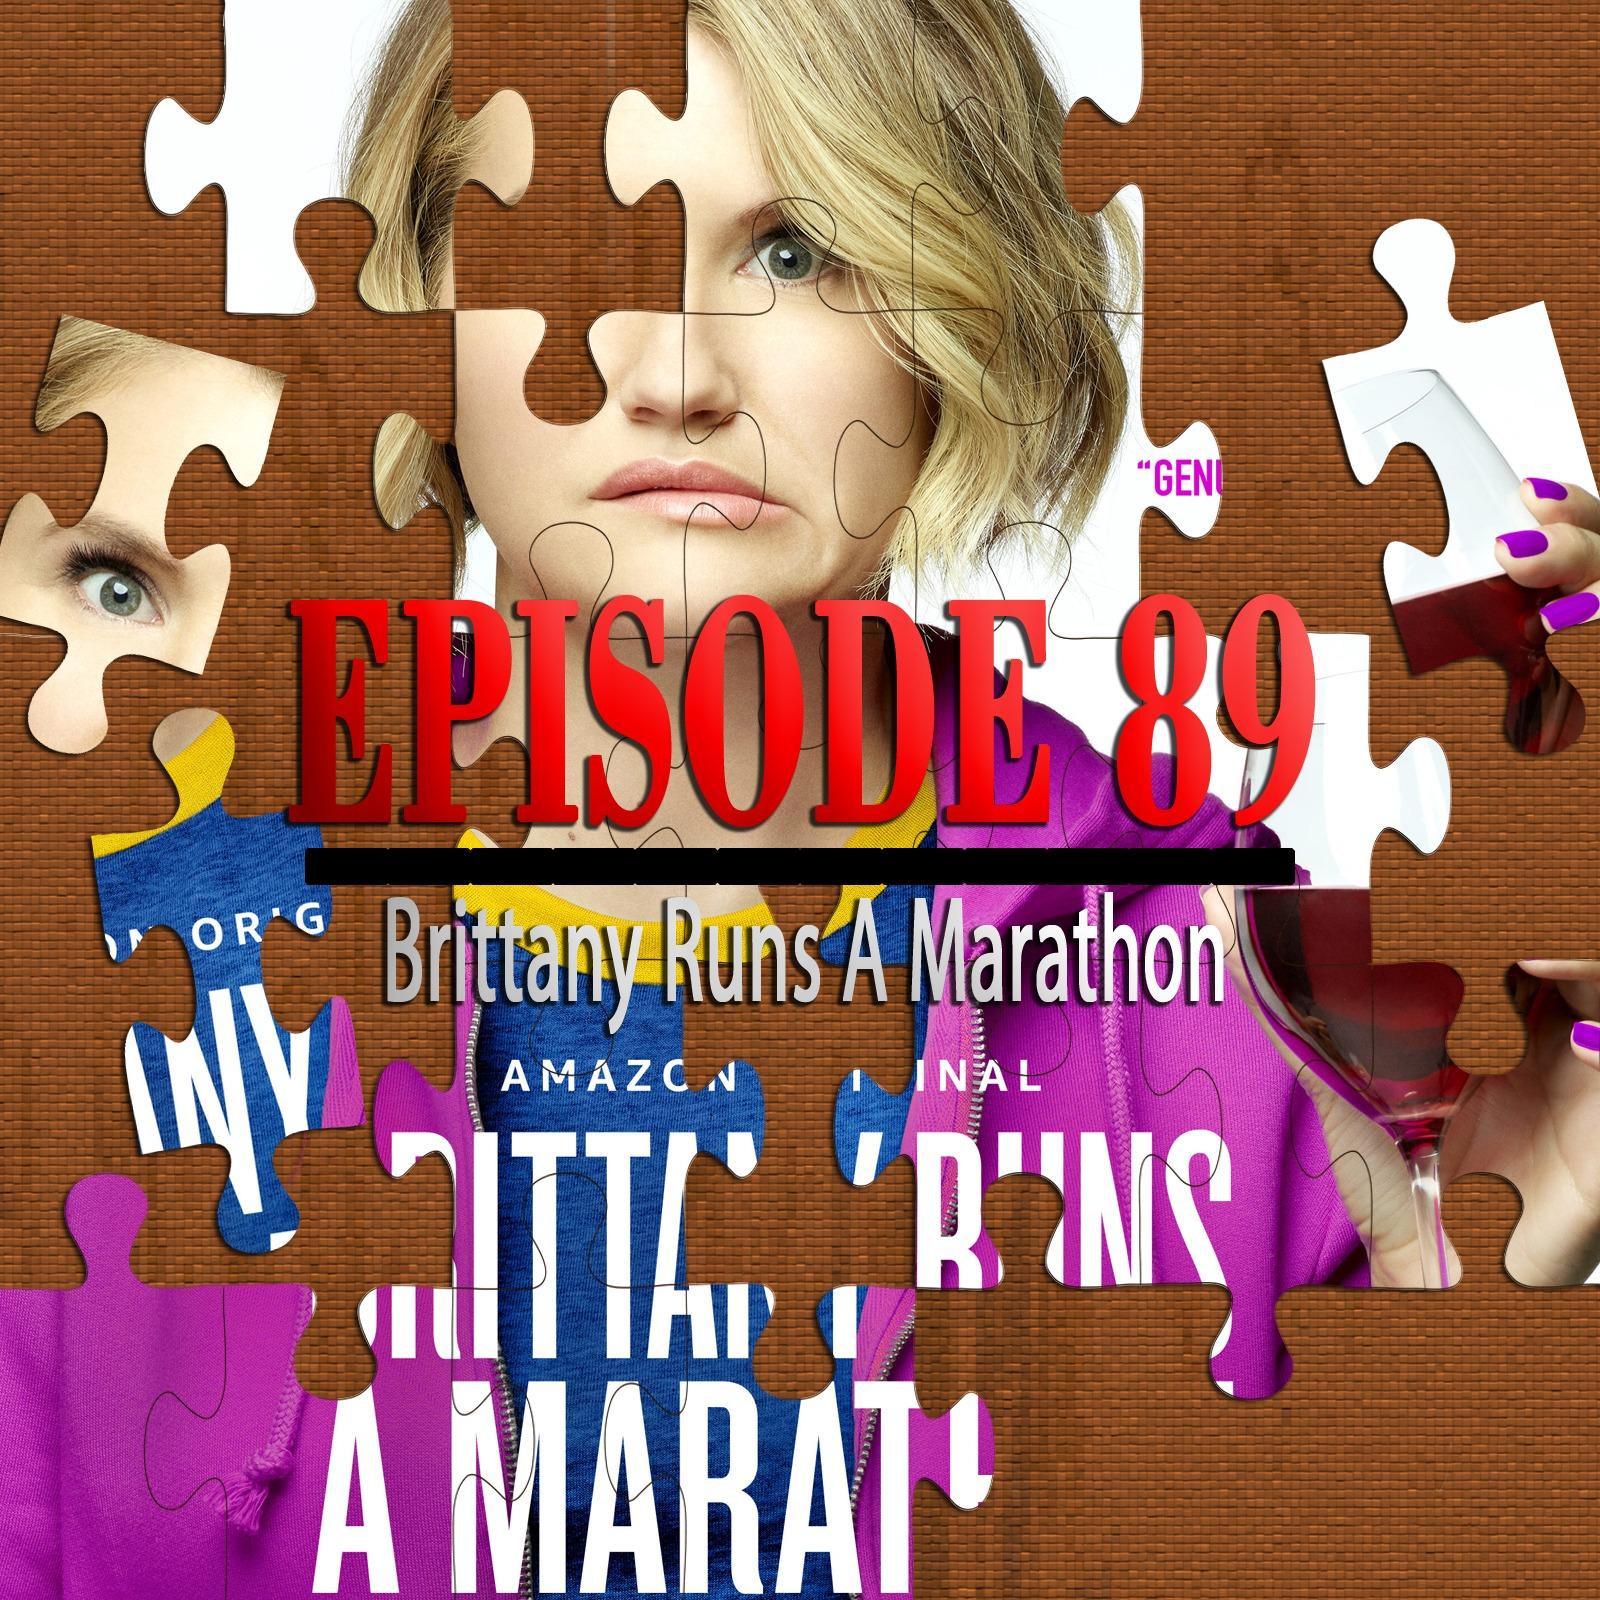 Brittany Runs A Marathon (Featuring Catherine Gonzales)